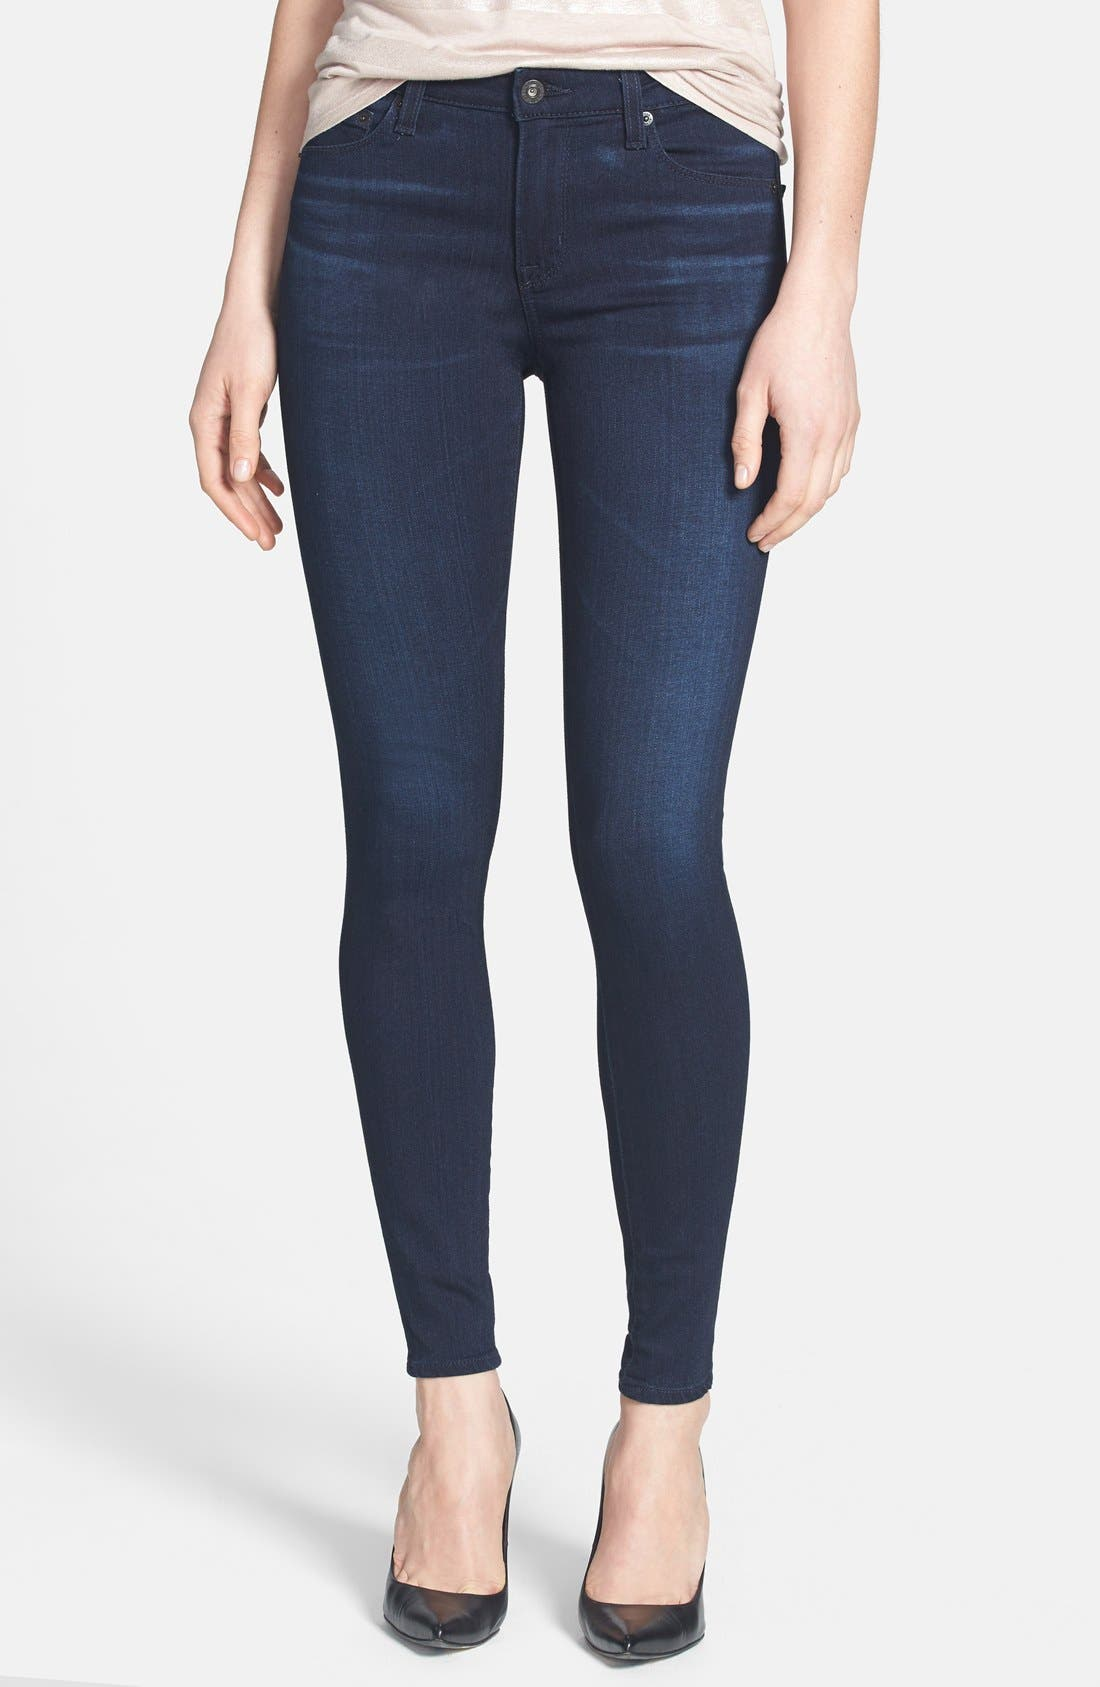 Alternate Image 1 Selected - Big Star 'Ava' Jeans Super Skinny Stretch Jeans (Harmony Dark) (Petite)